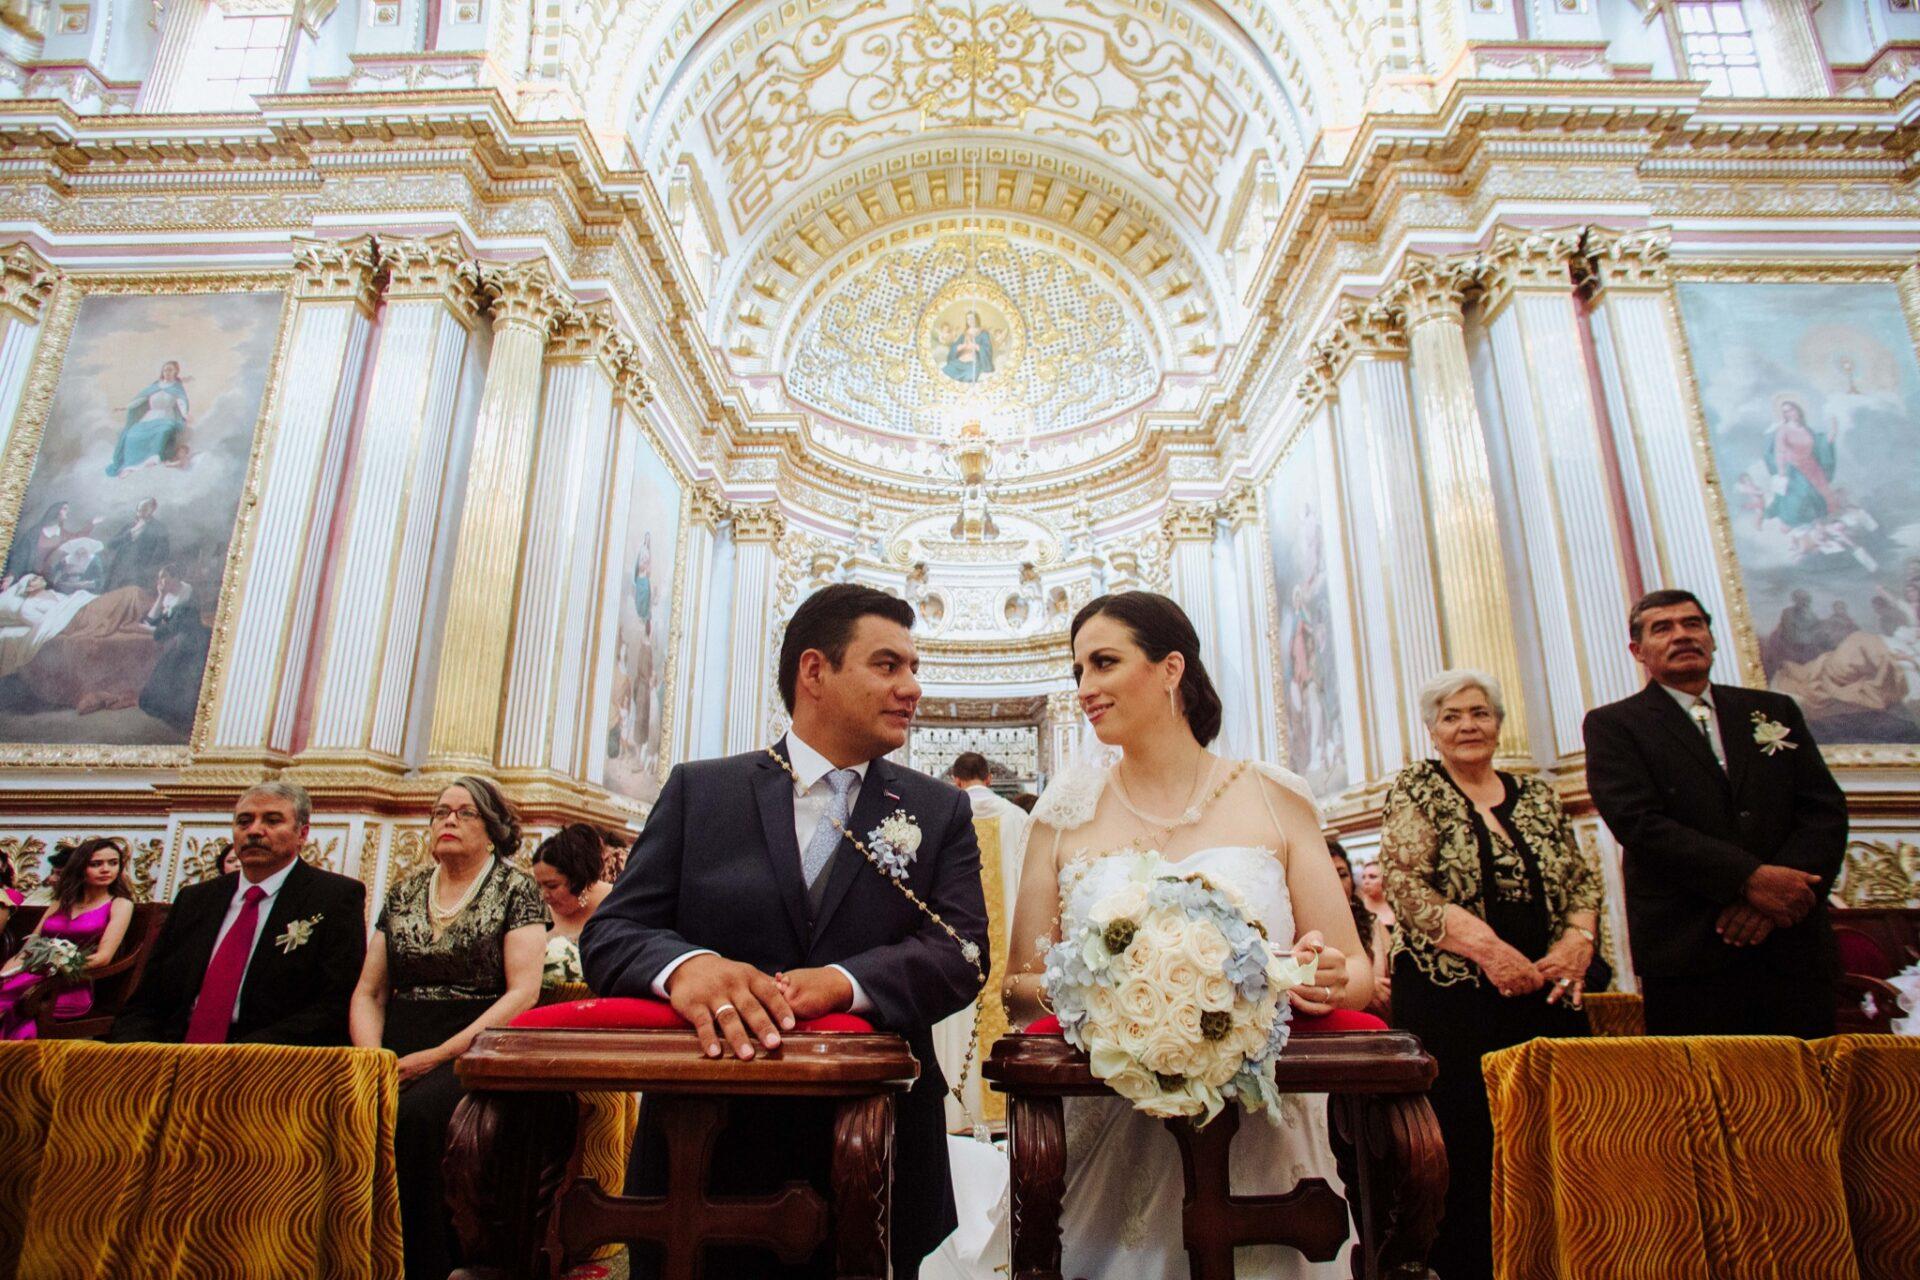 javier_noriega_fotografo_bodas_centro_platero_zacatecas_wedding_photographer15